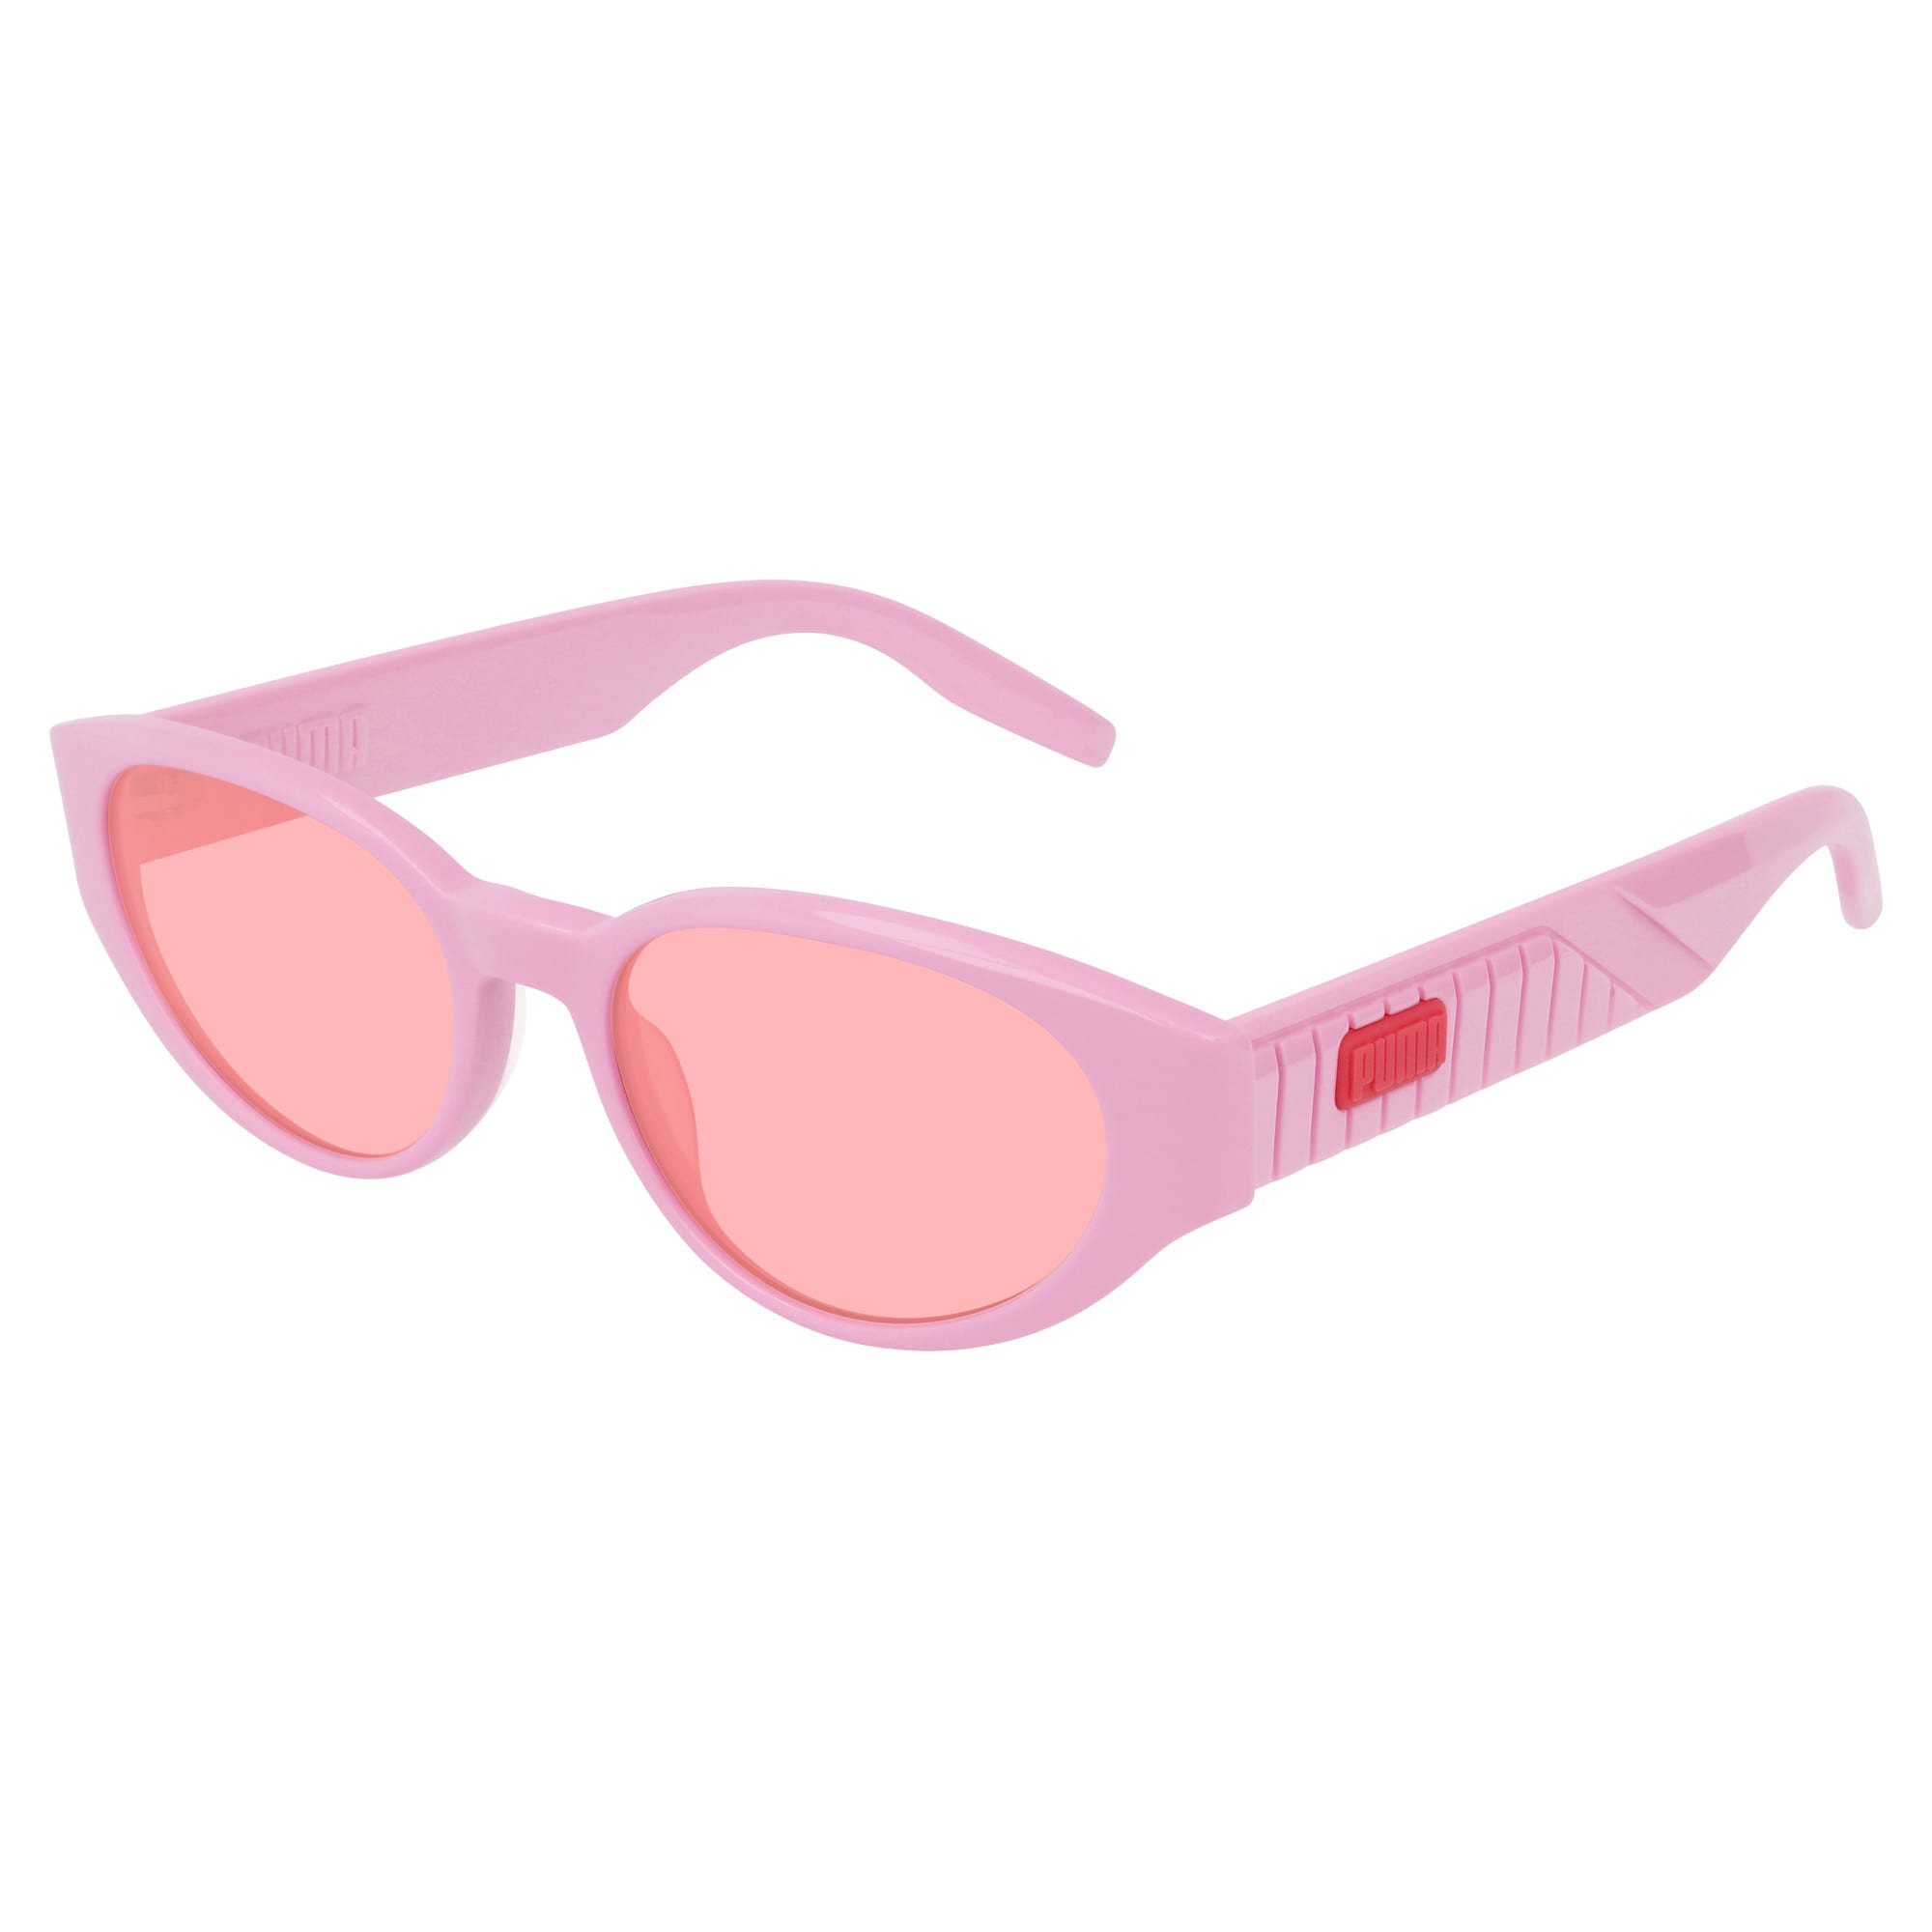 Thumbnail 1 of Victoria Beach Women's Sunglasses, PINK-PINK-RED, medium